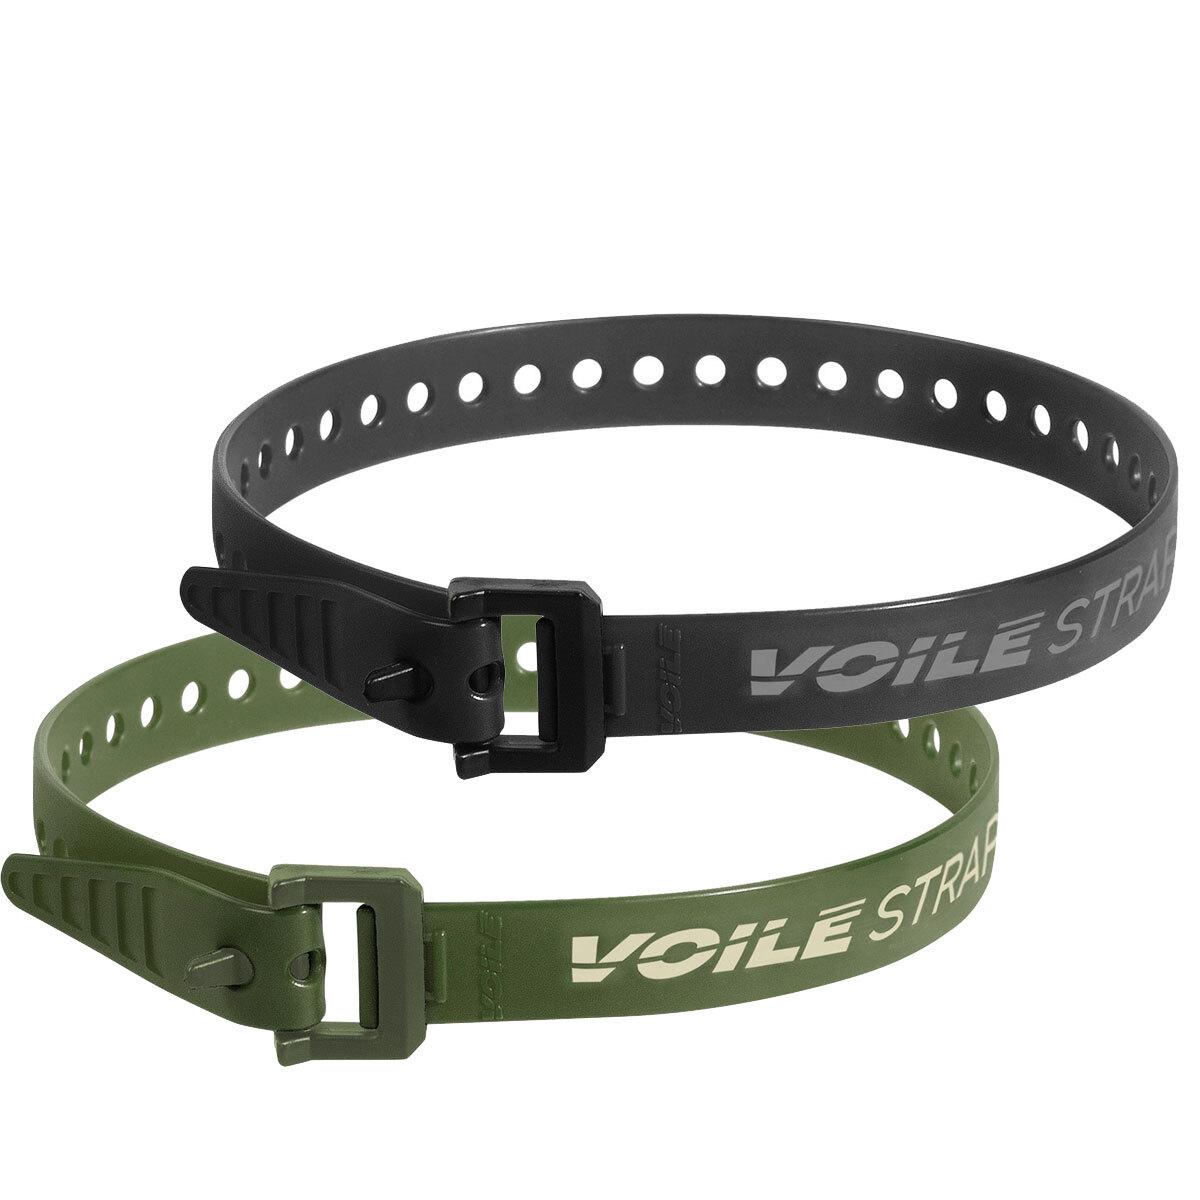 "VOILE Straps 20"" Nylon Buckle ストラップ ナイロンバックル 20インチ"